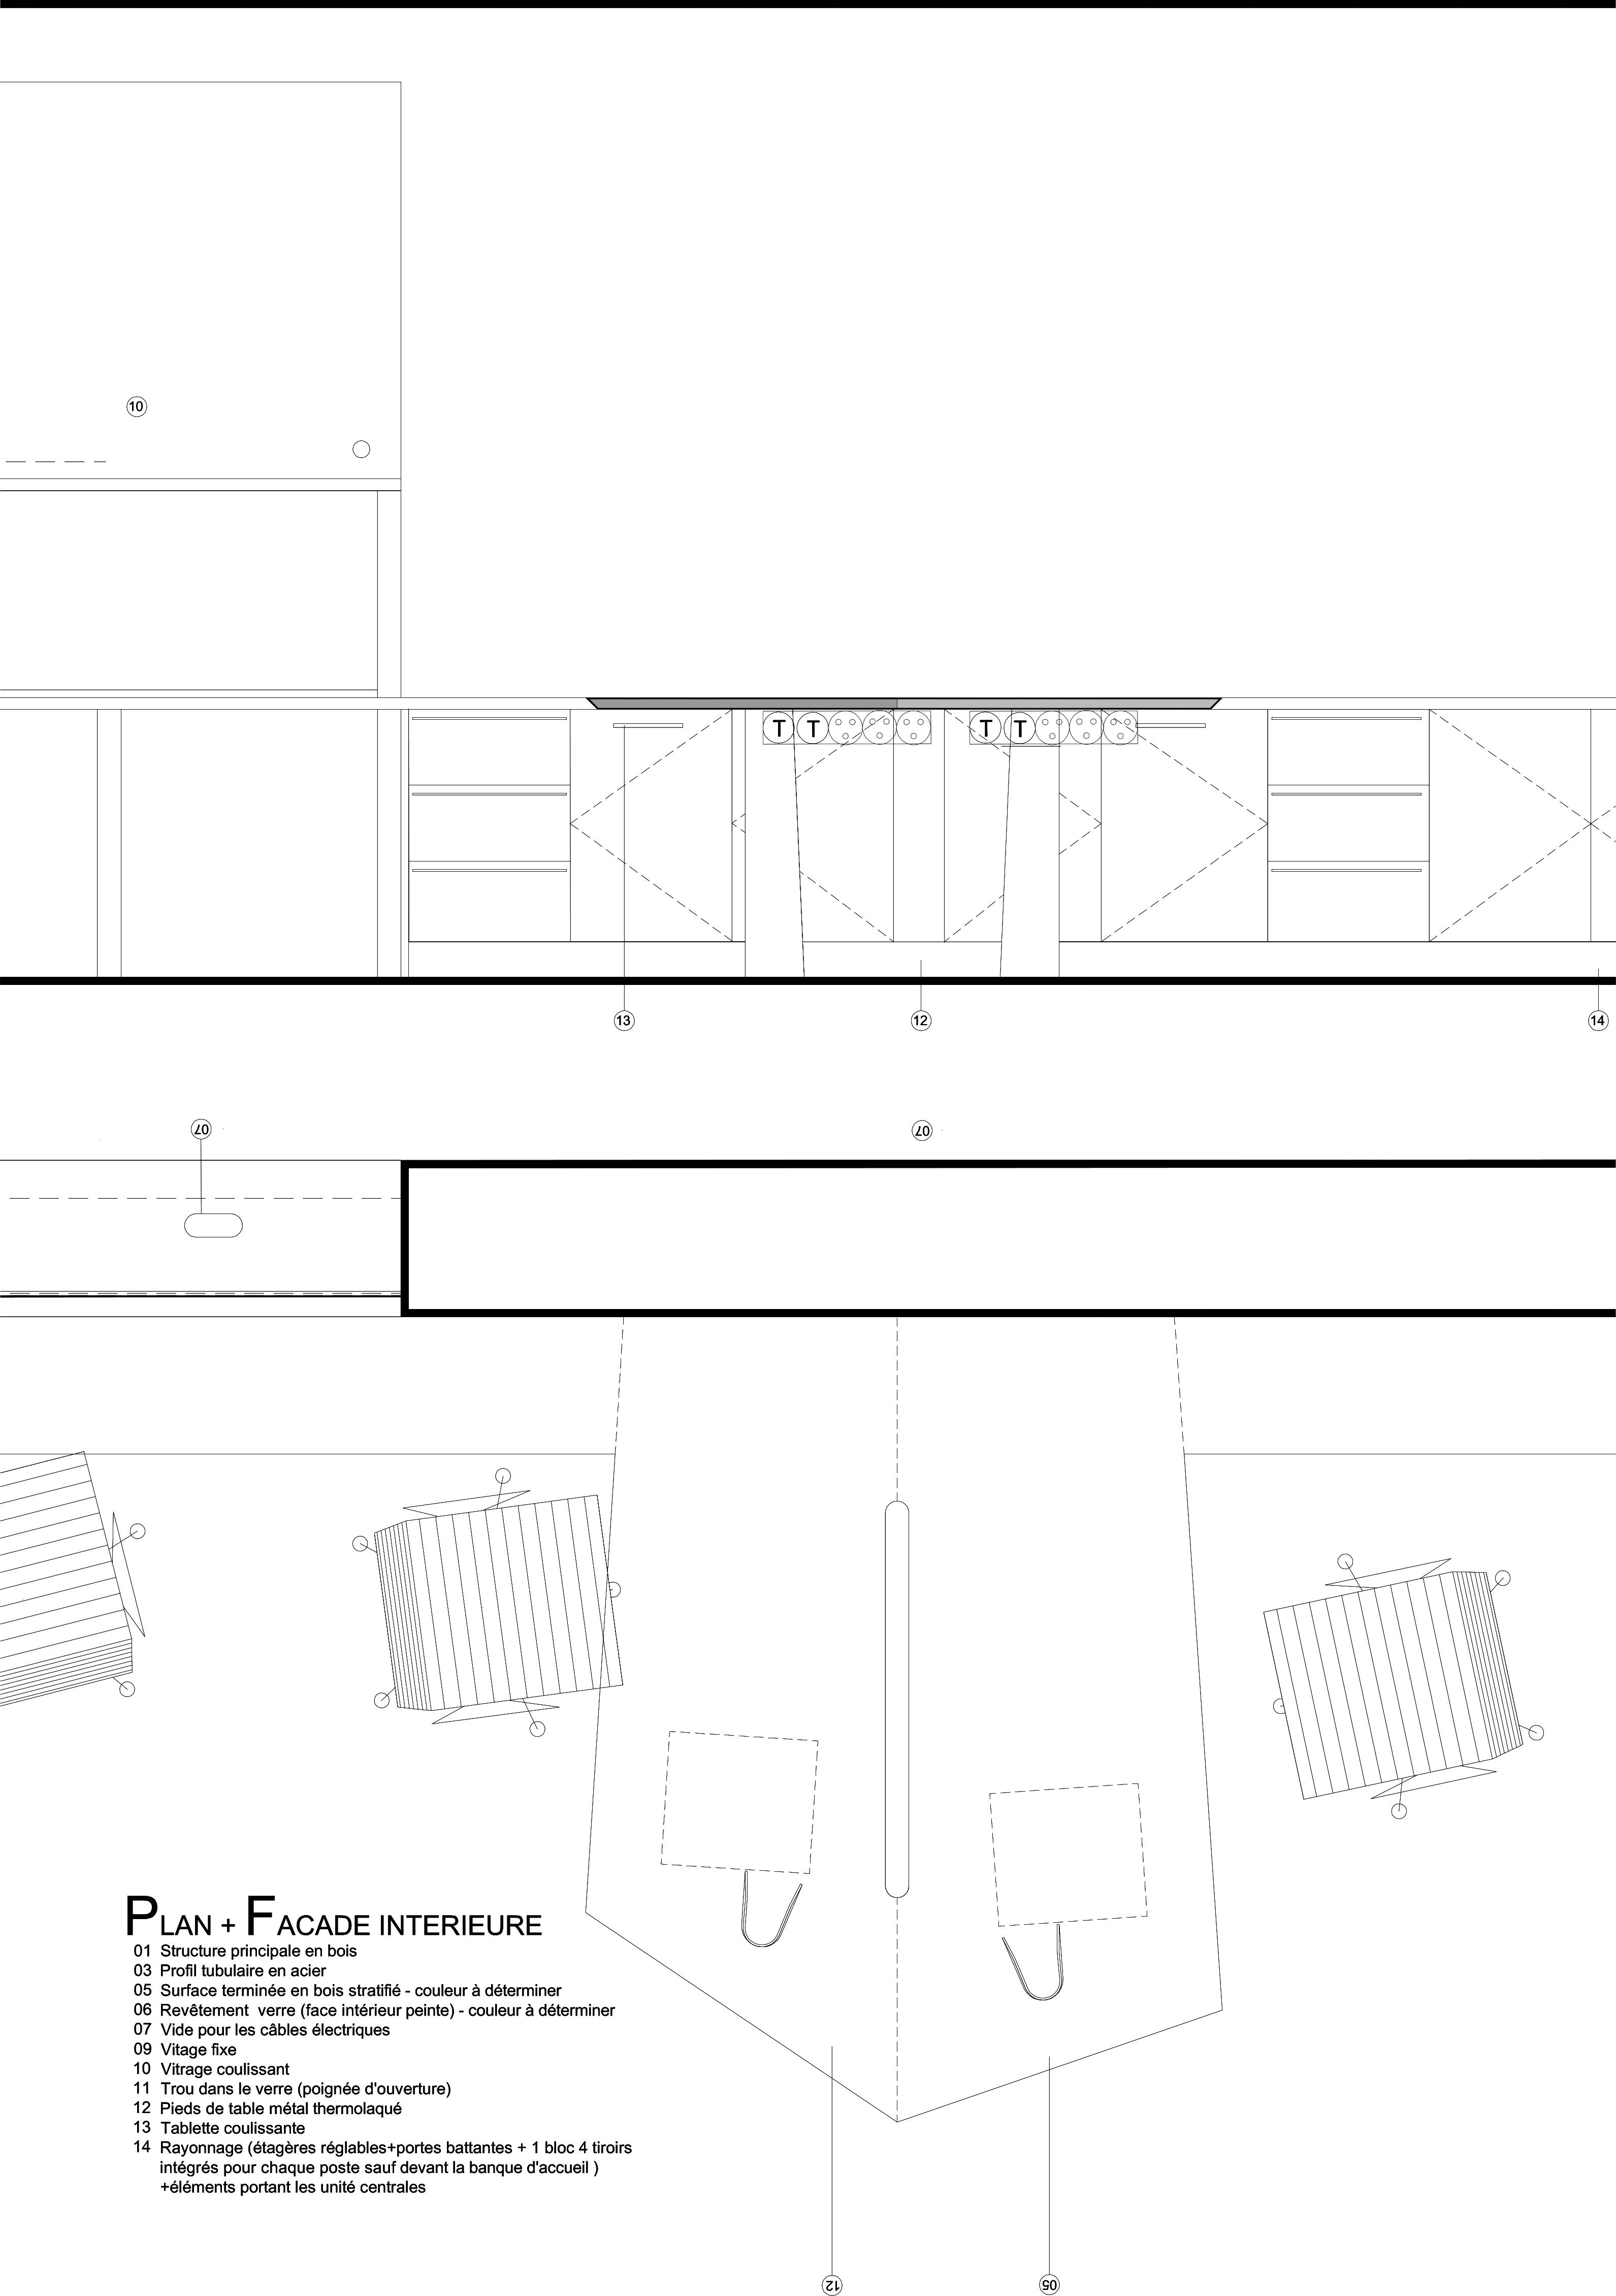 \LACIE-2BIGPublicSTUDIOMUSTARD1-GEOTECPLANSGEO-INTERIEUR-E